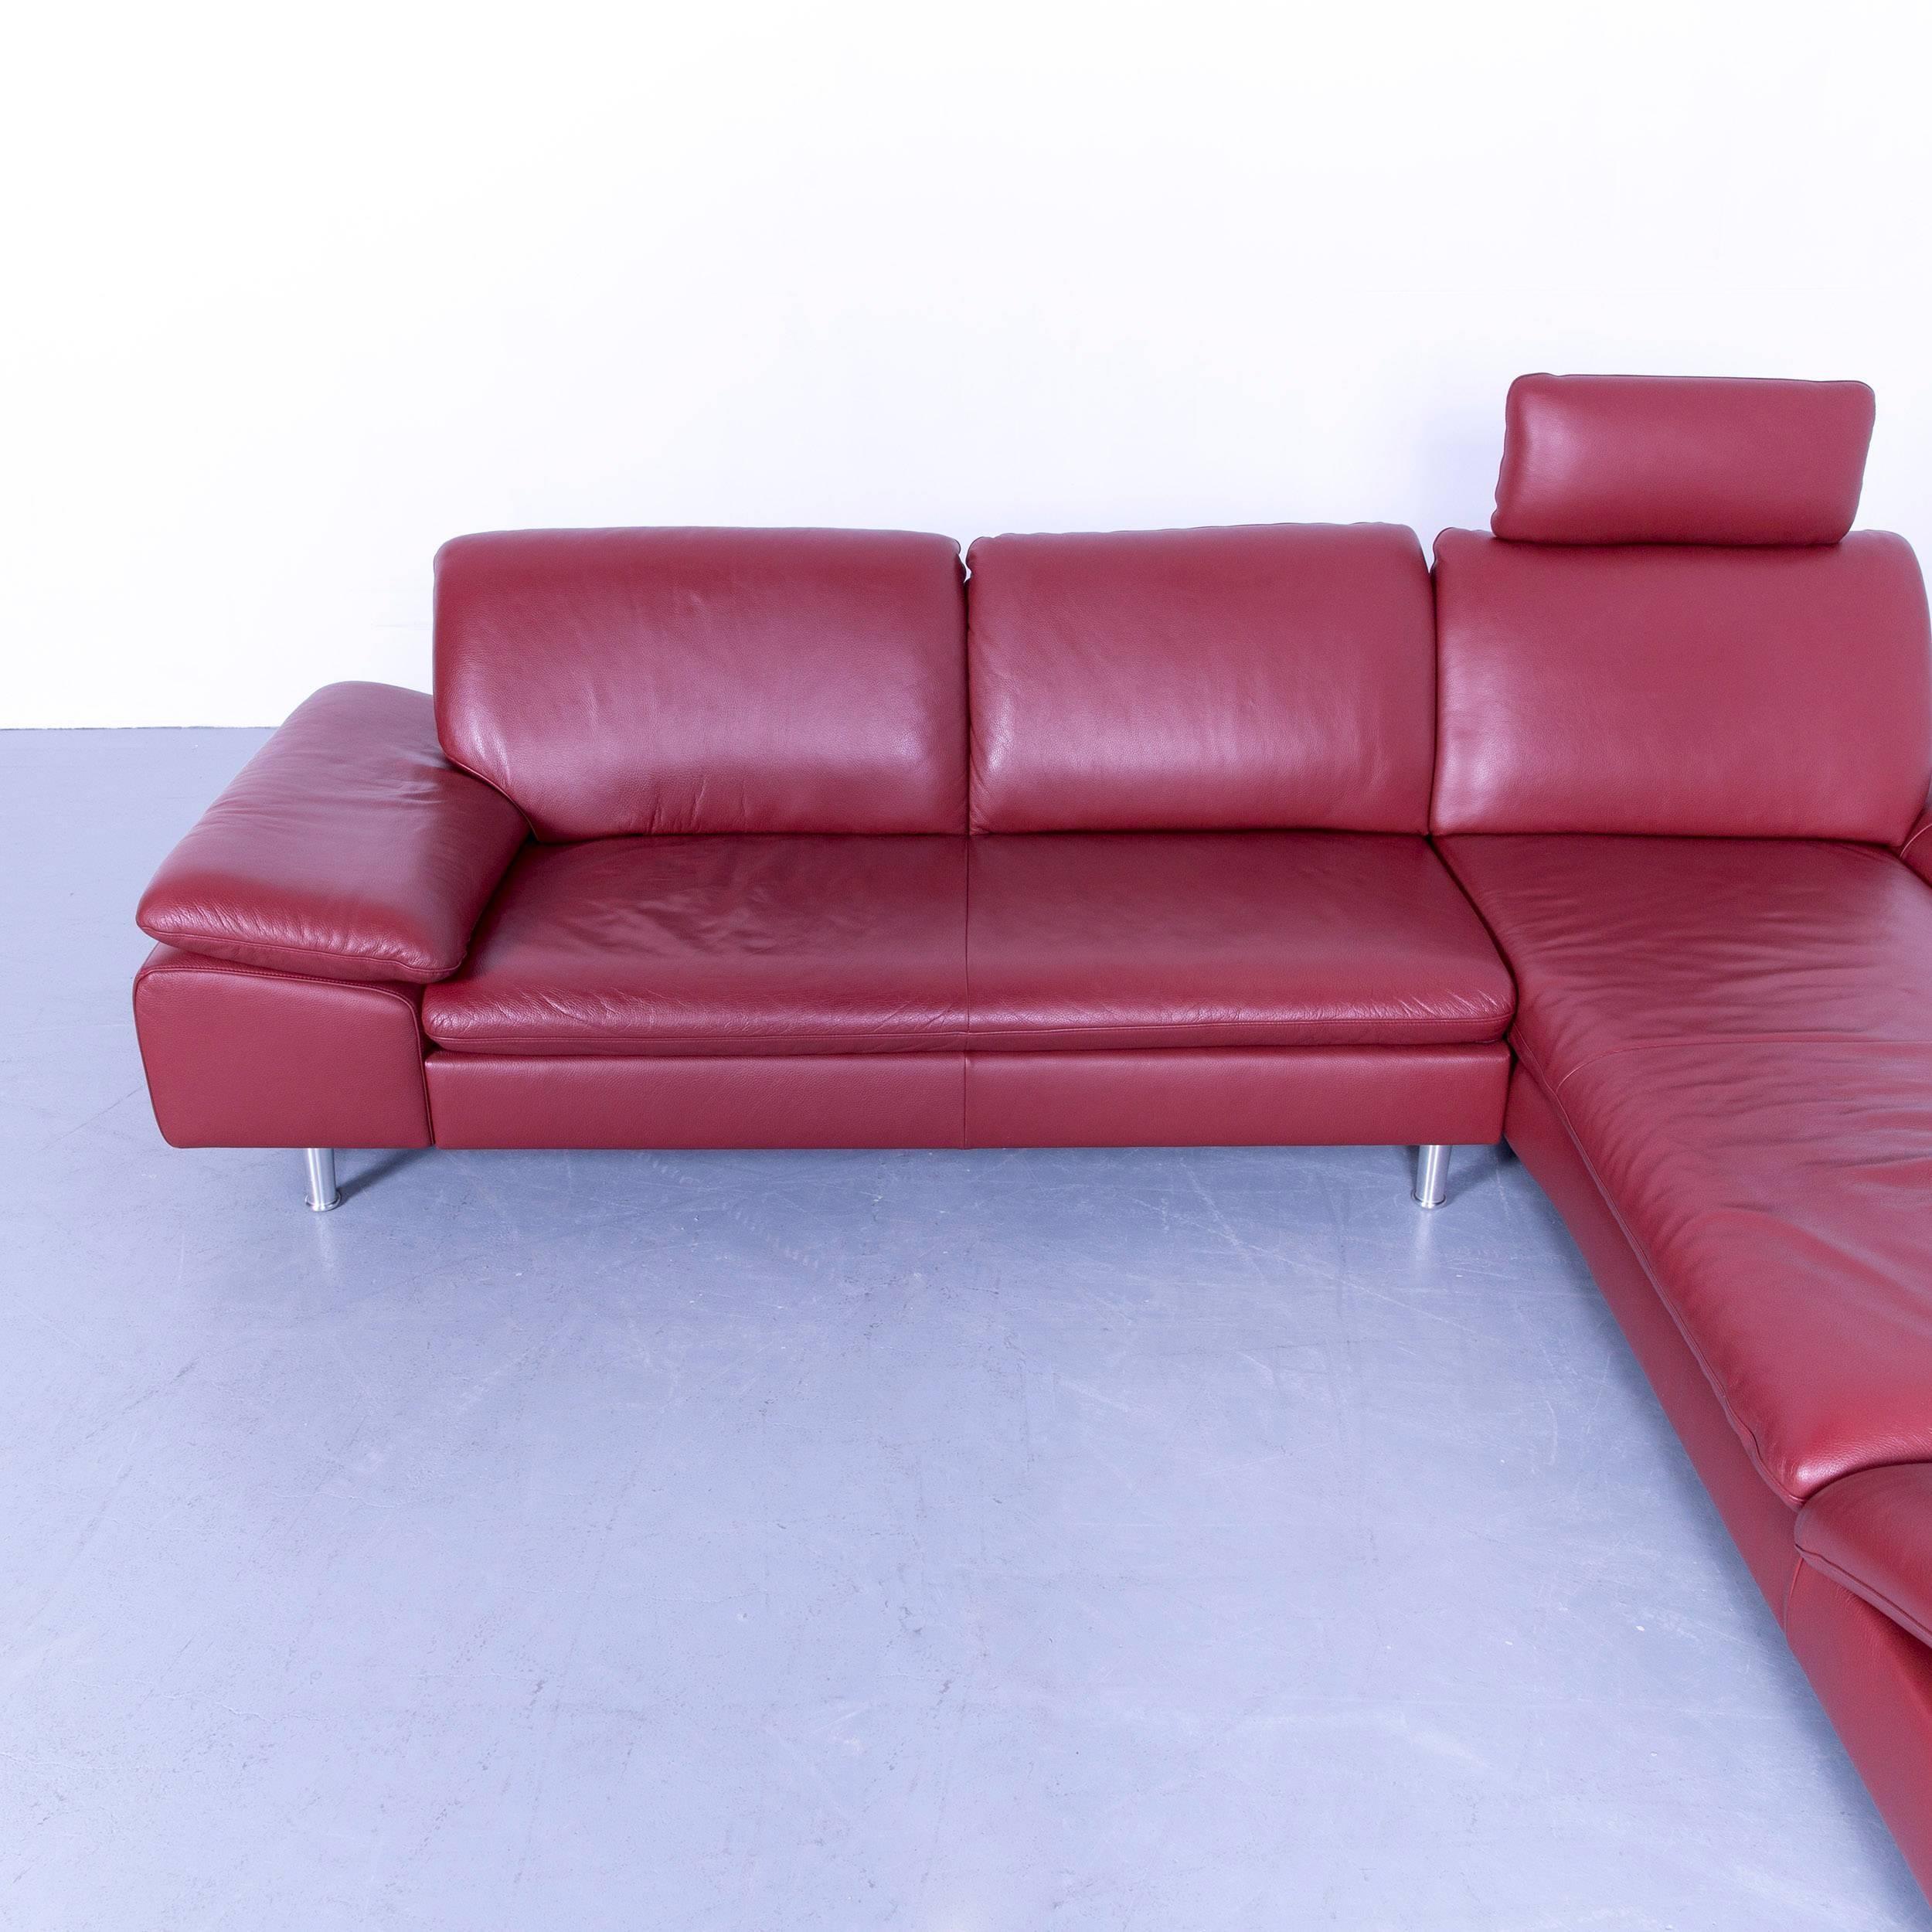 schlafsofa rot leder affordable ikea sofa rot ikea sofa klippan wie neu bezug uni rot reine. Black Bedroom Furniture Sets. Home Design Ideas